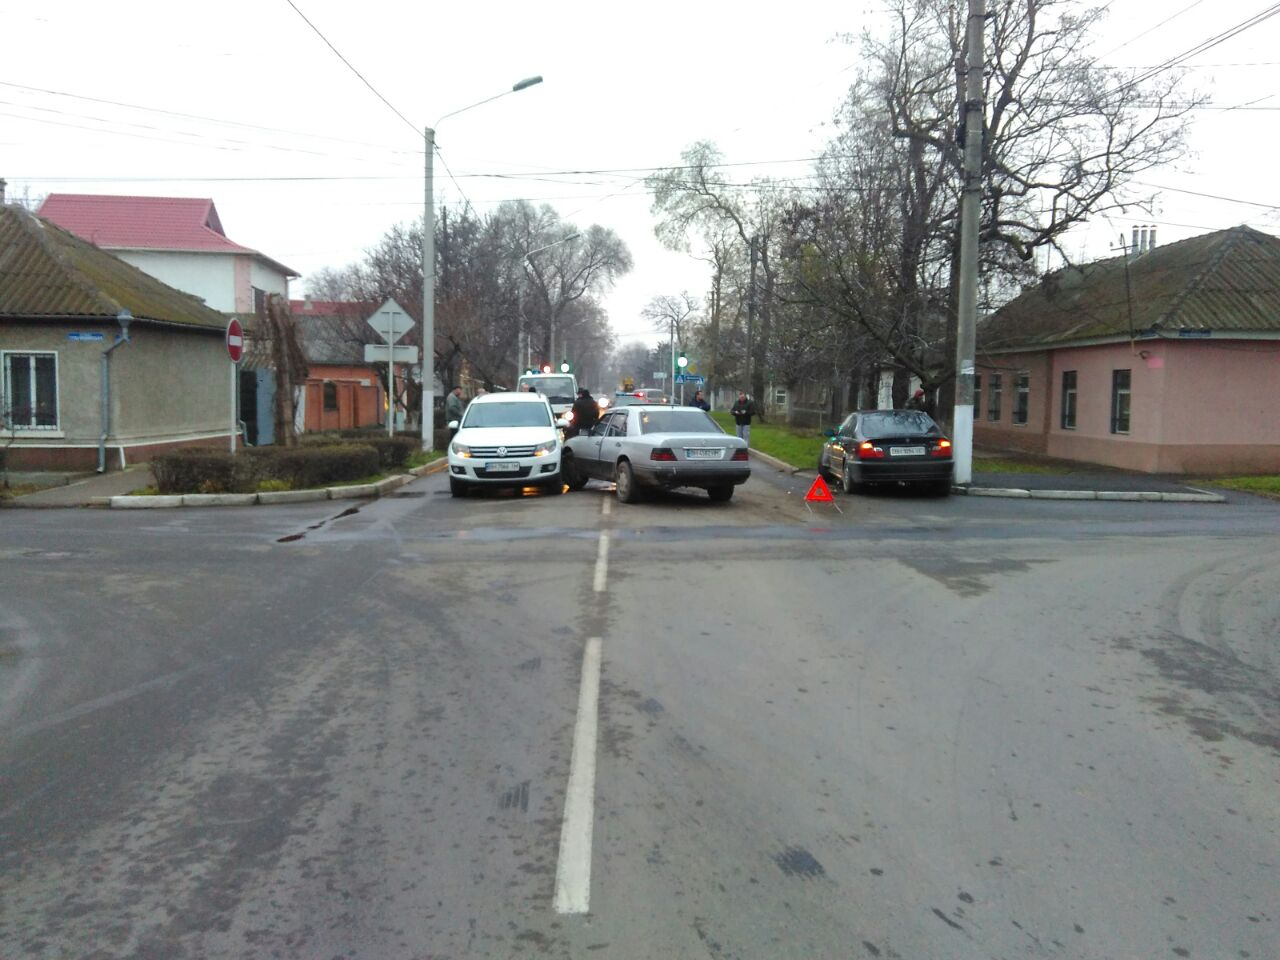 6346346 Бильярд на дороге: в Измаиле Mercedes протаранил BMW и Volkswagen